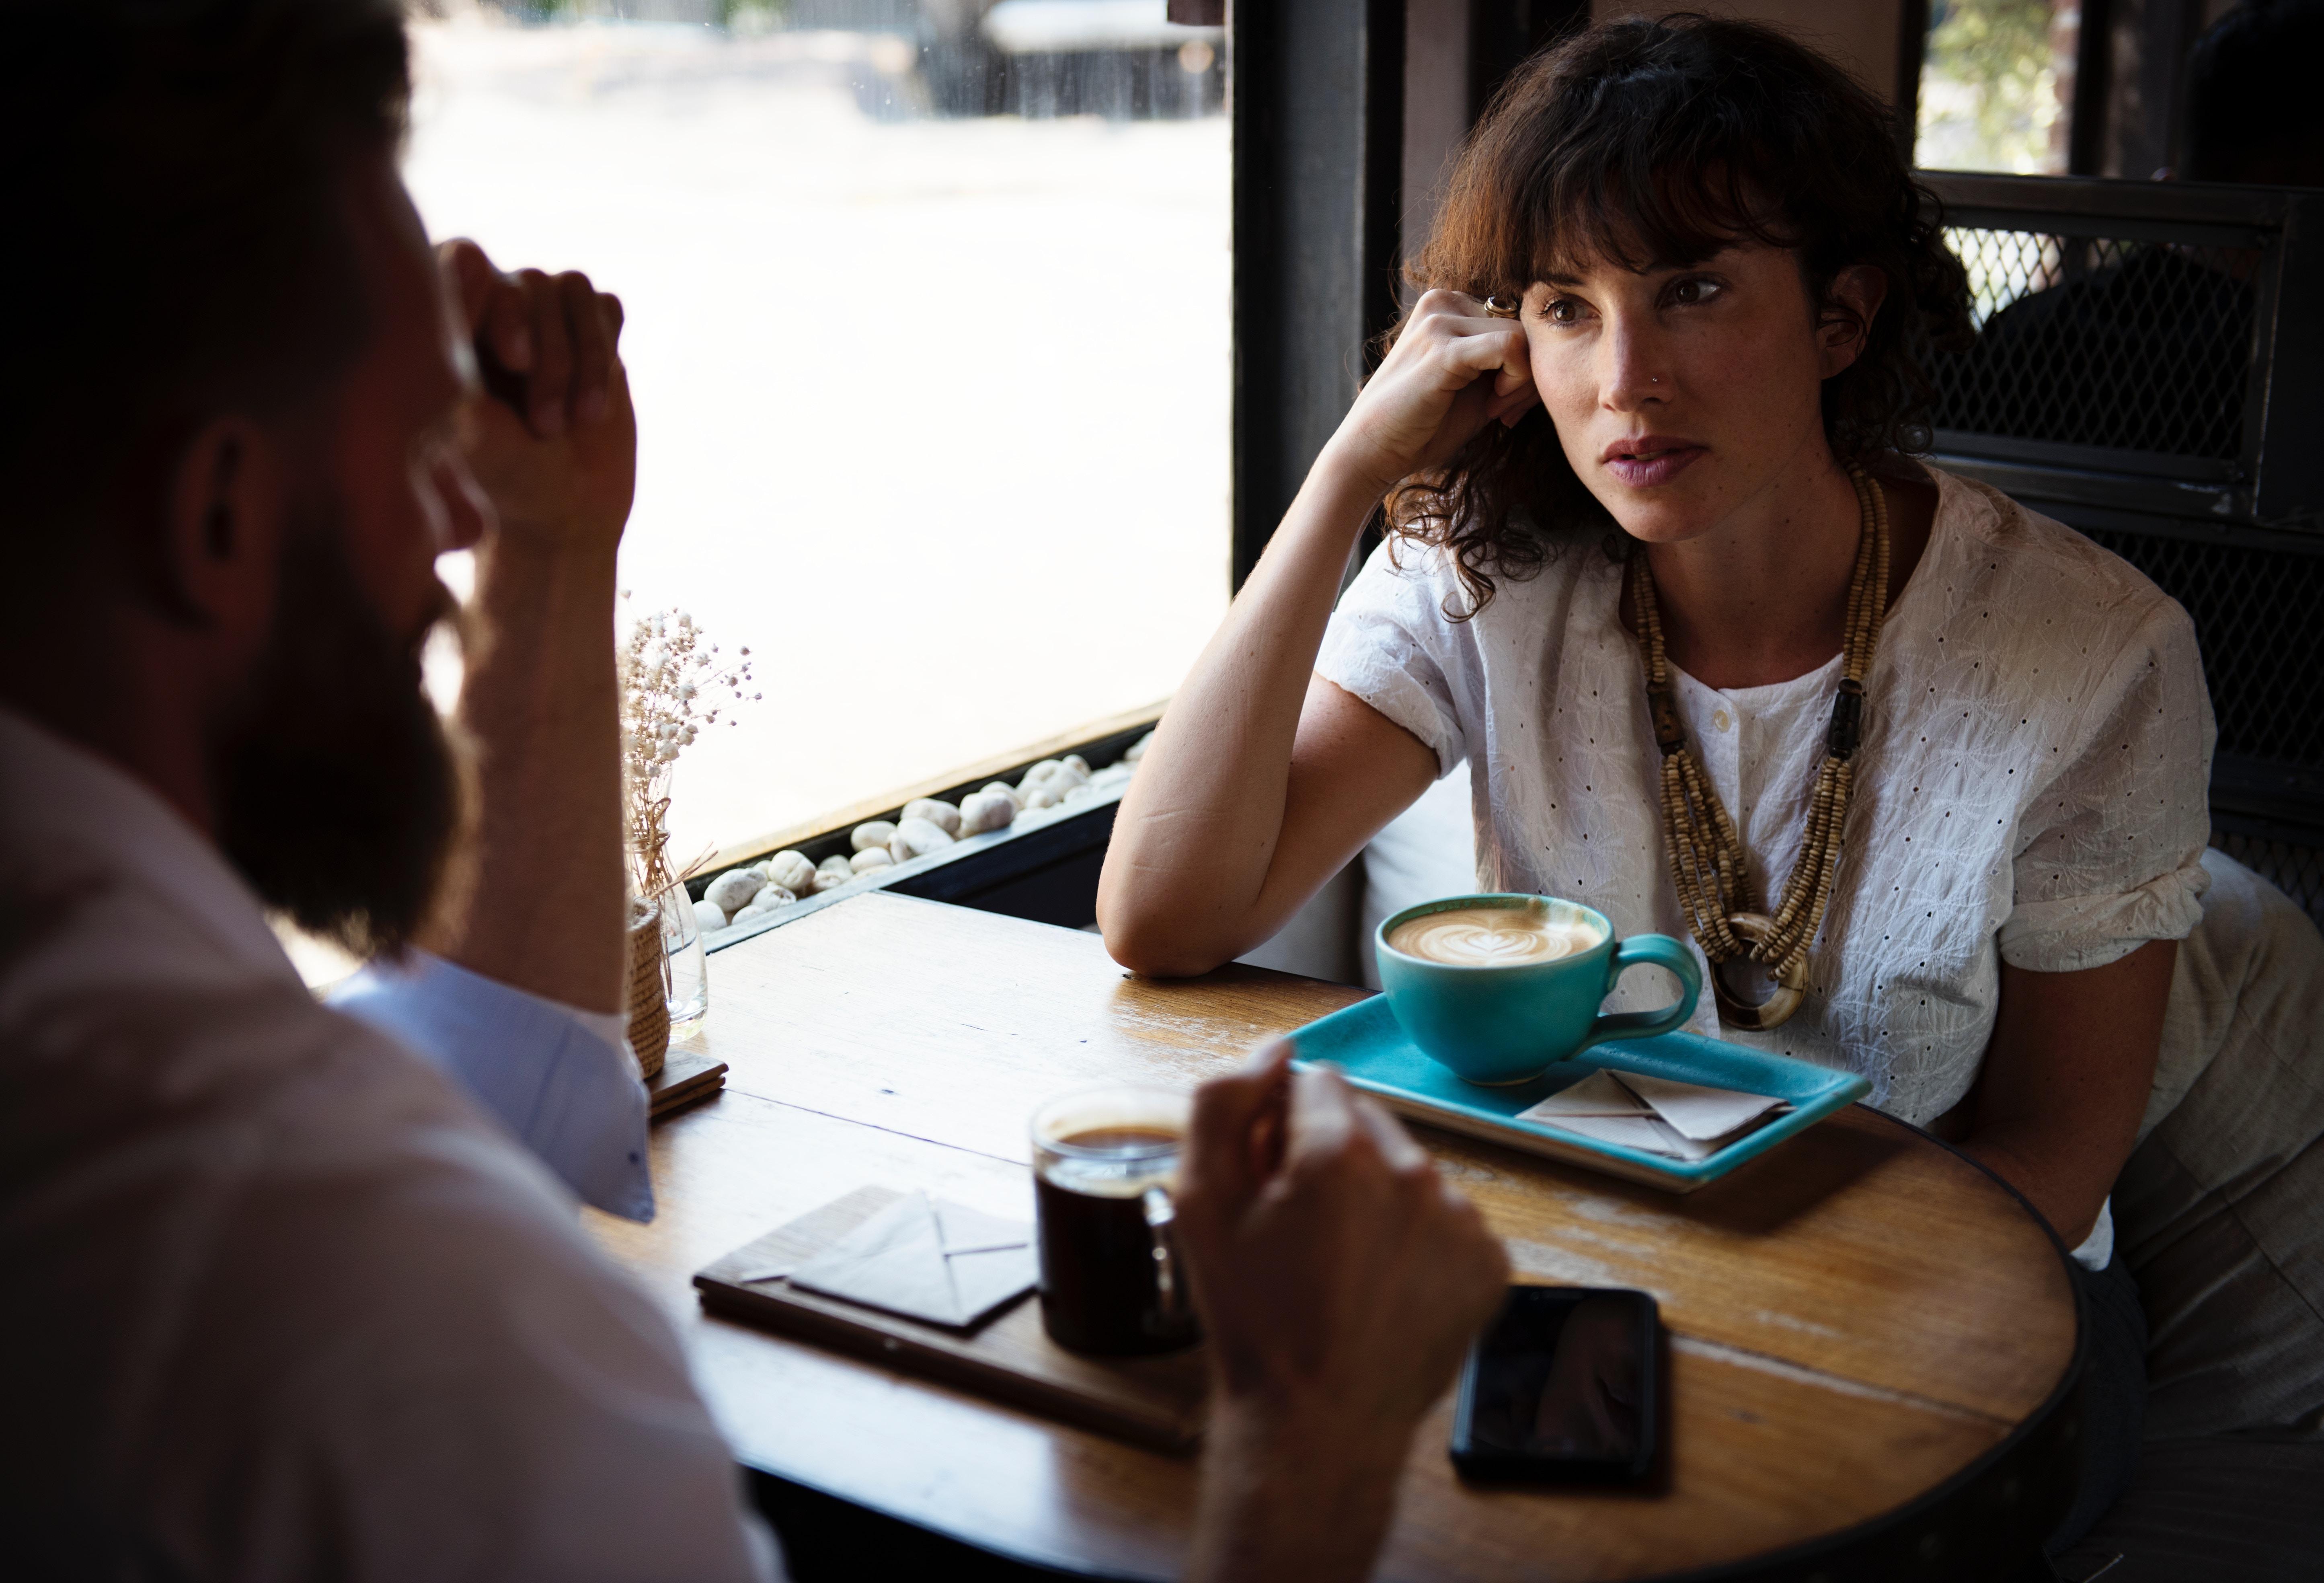 Two people having coffee